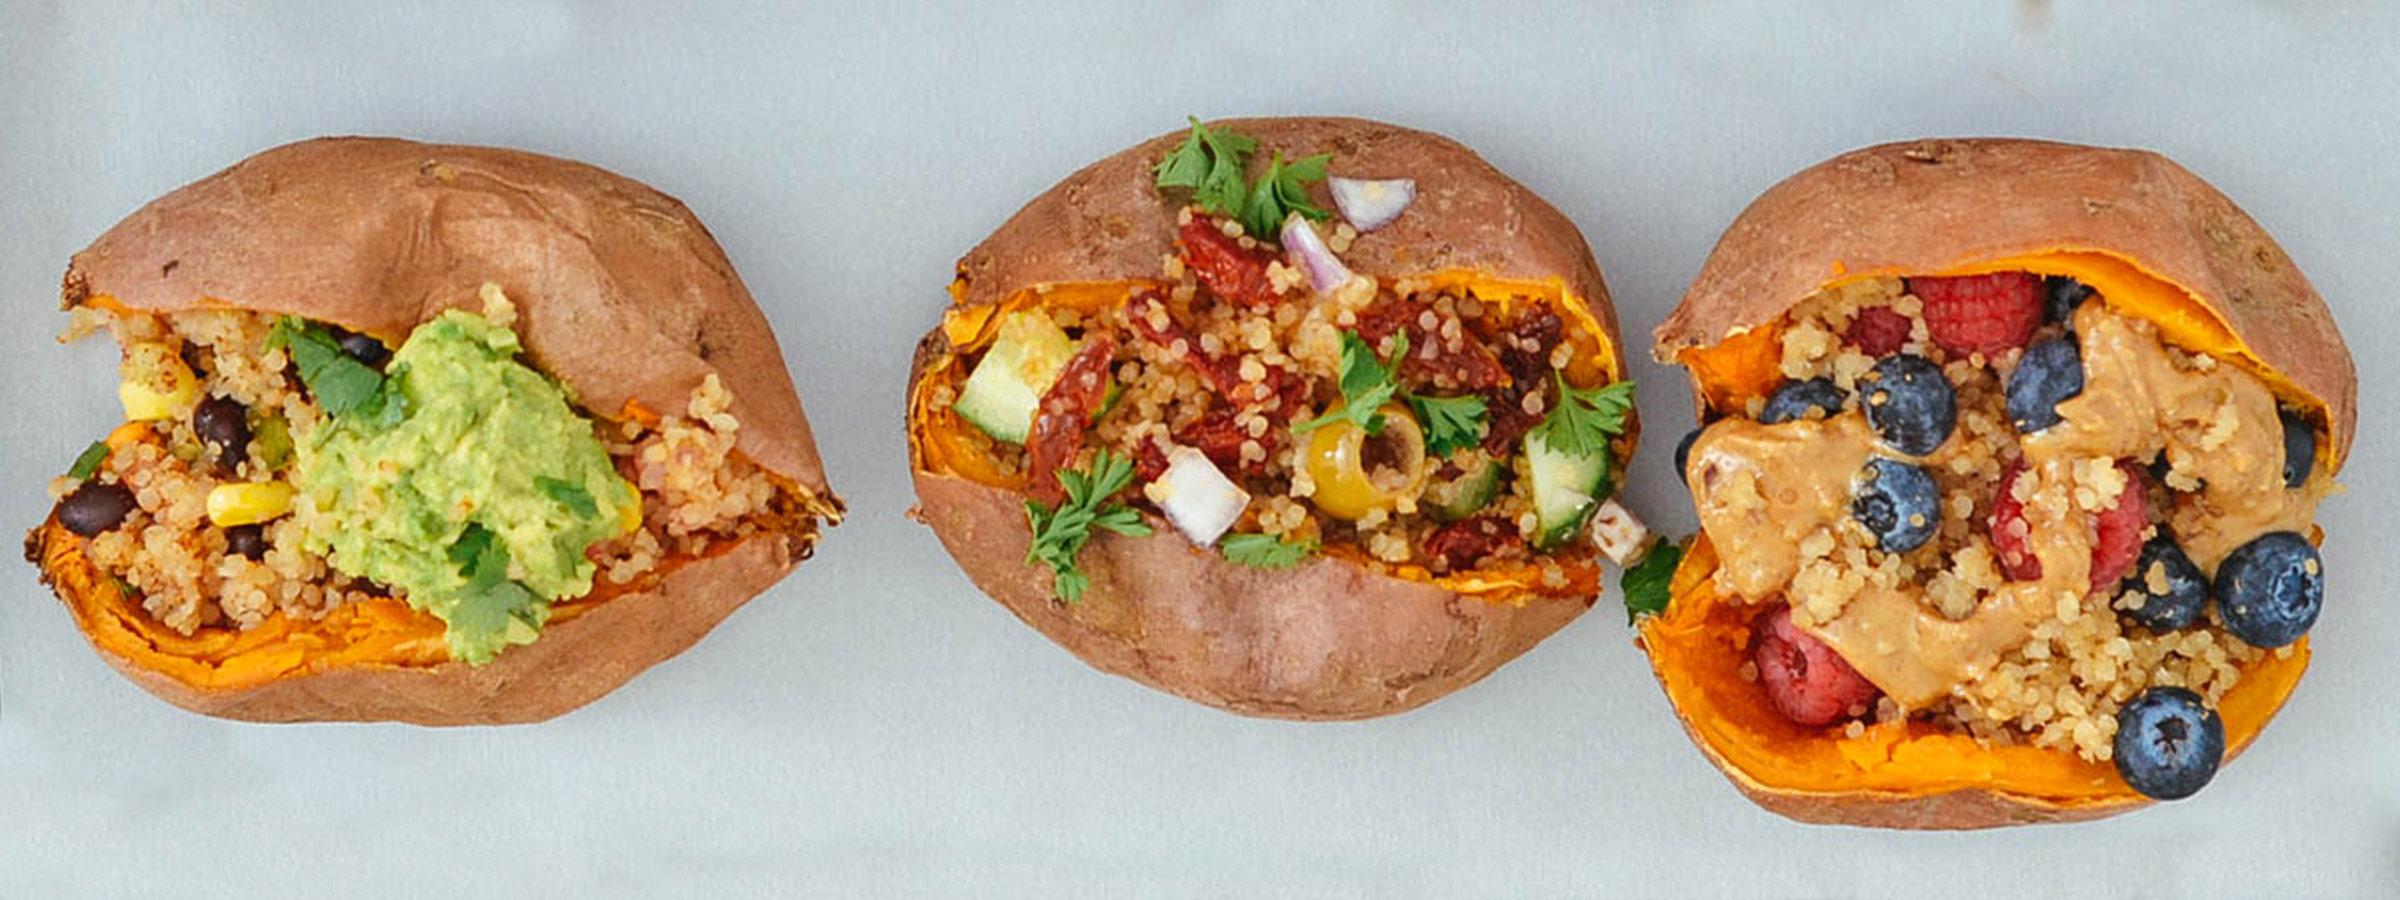 mex quinoa sweet potato hero